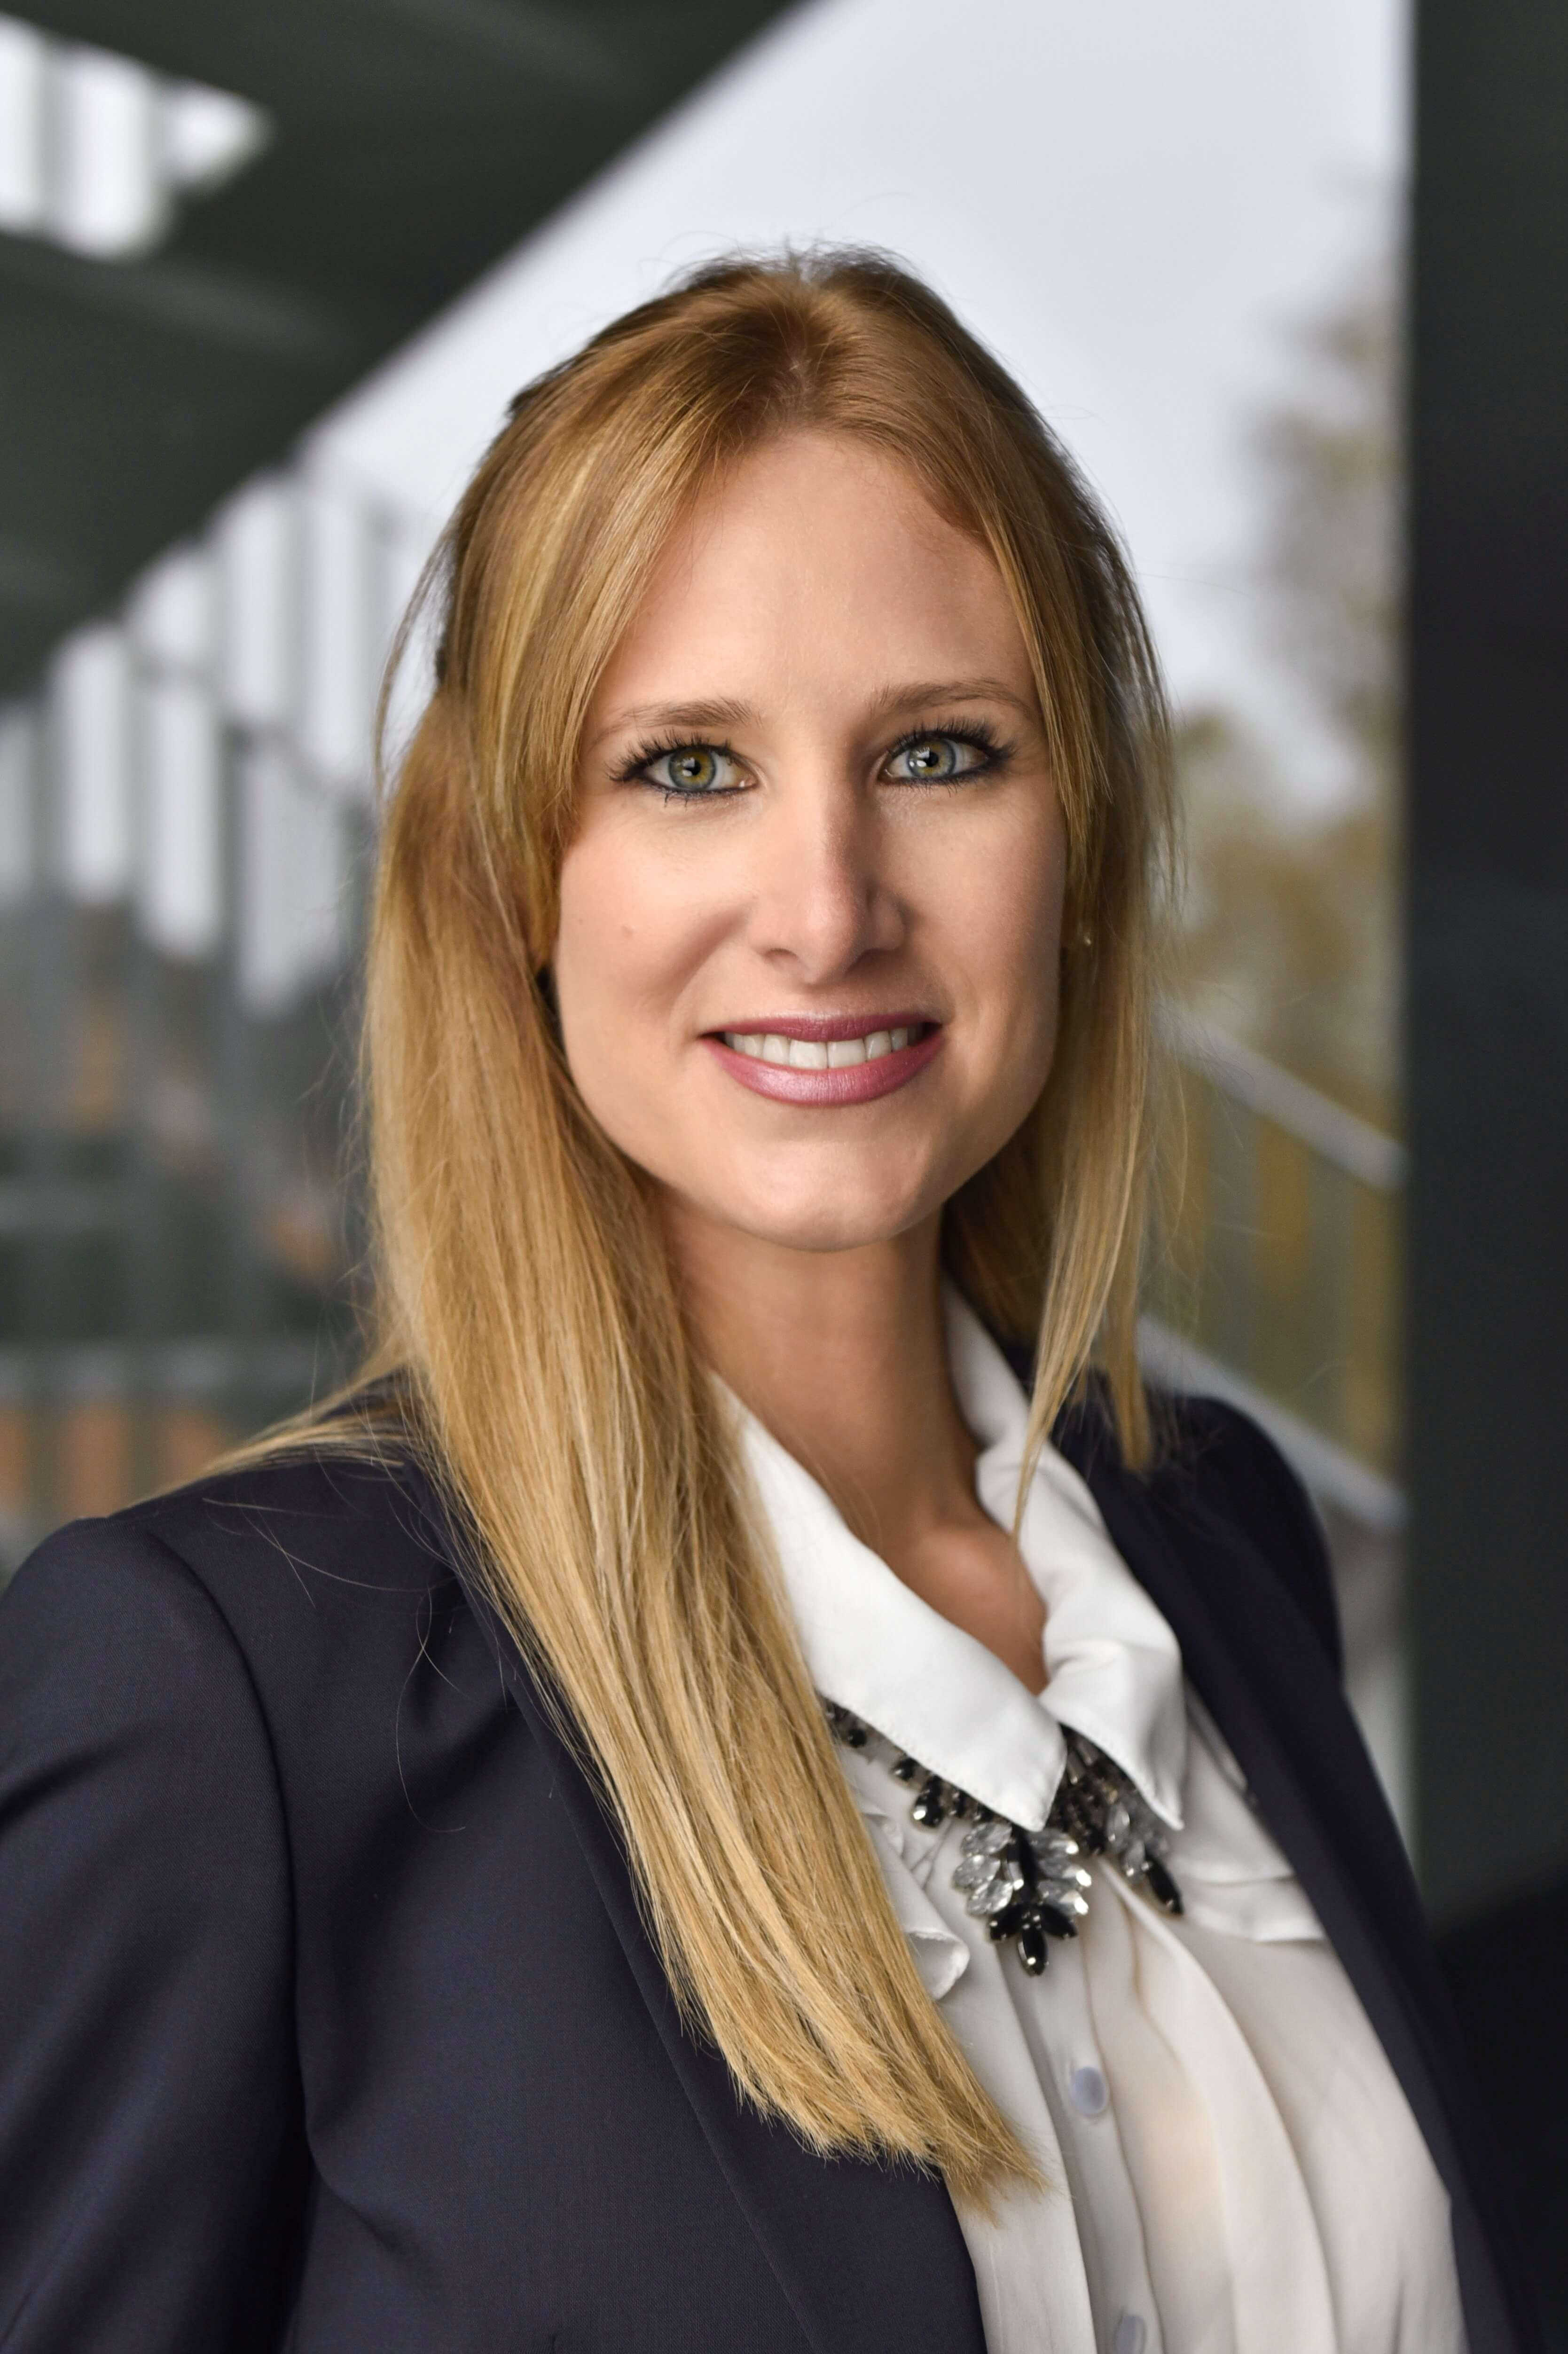 Nicole Wacker